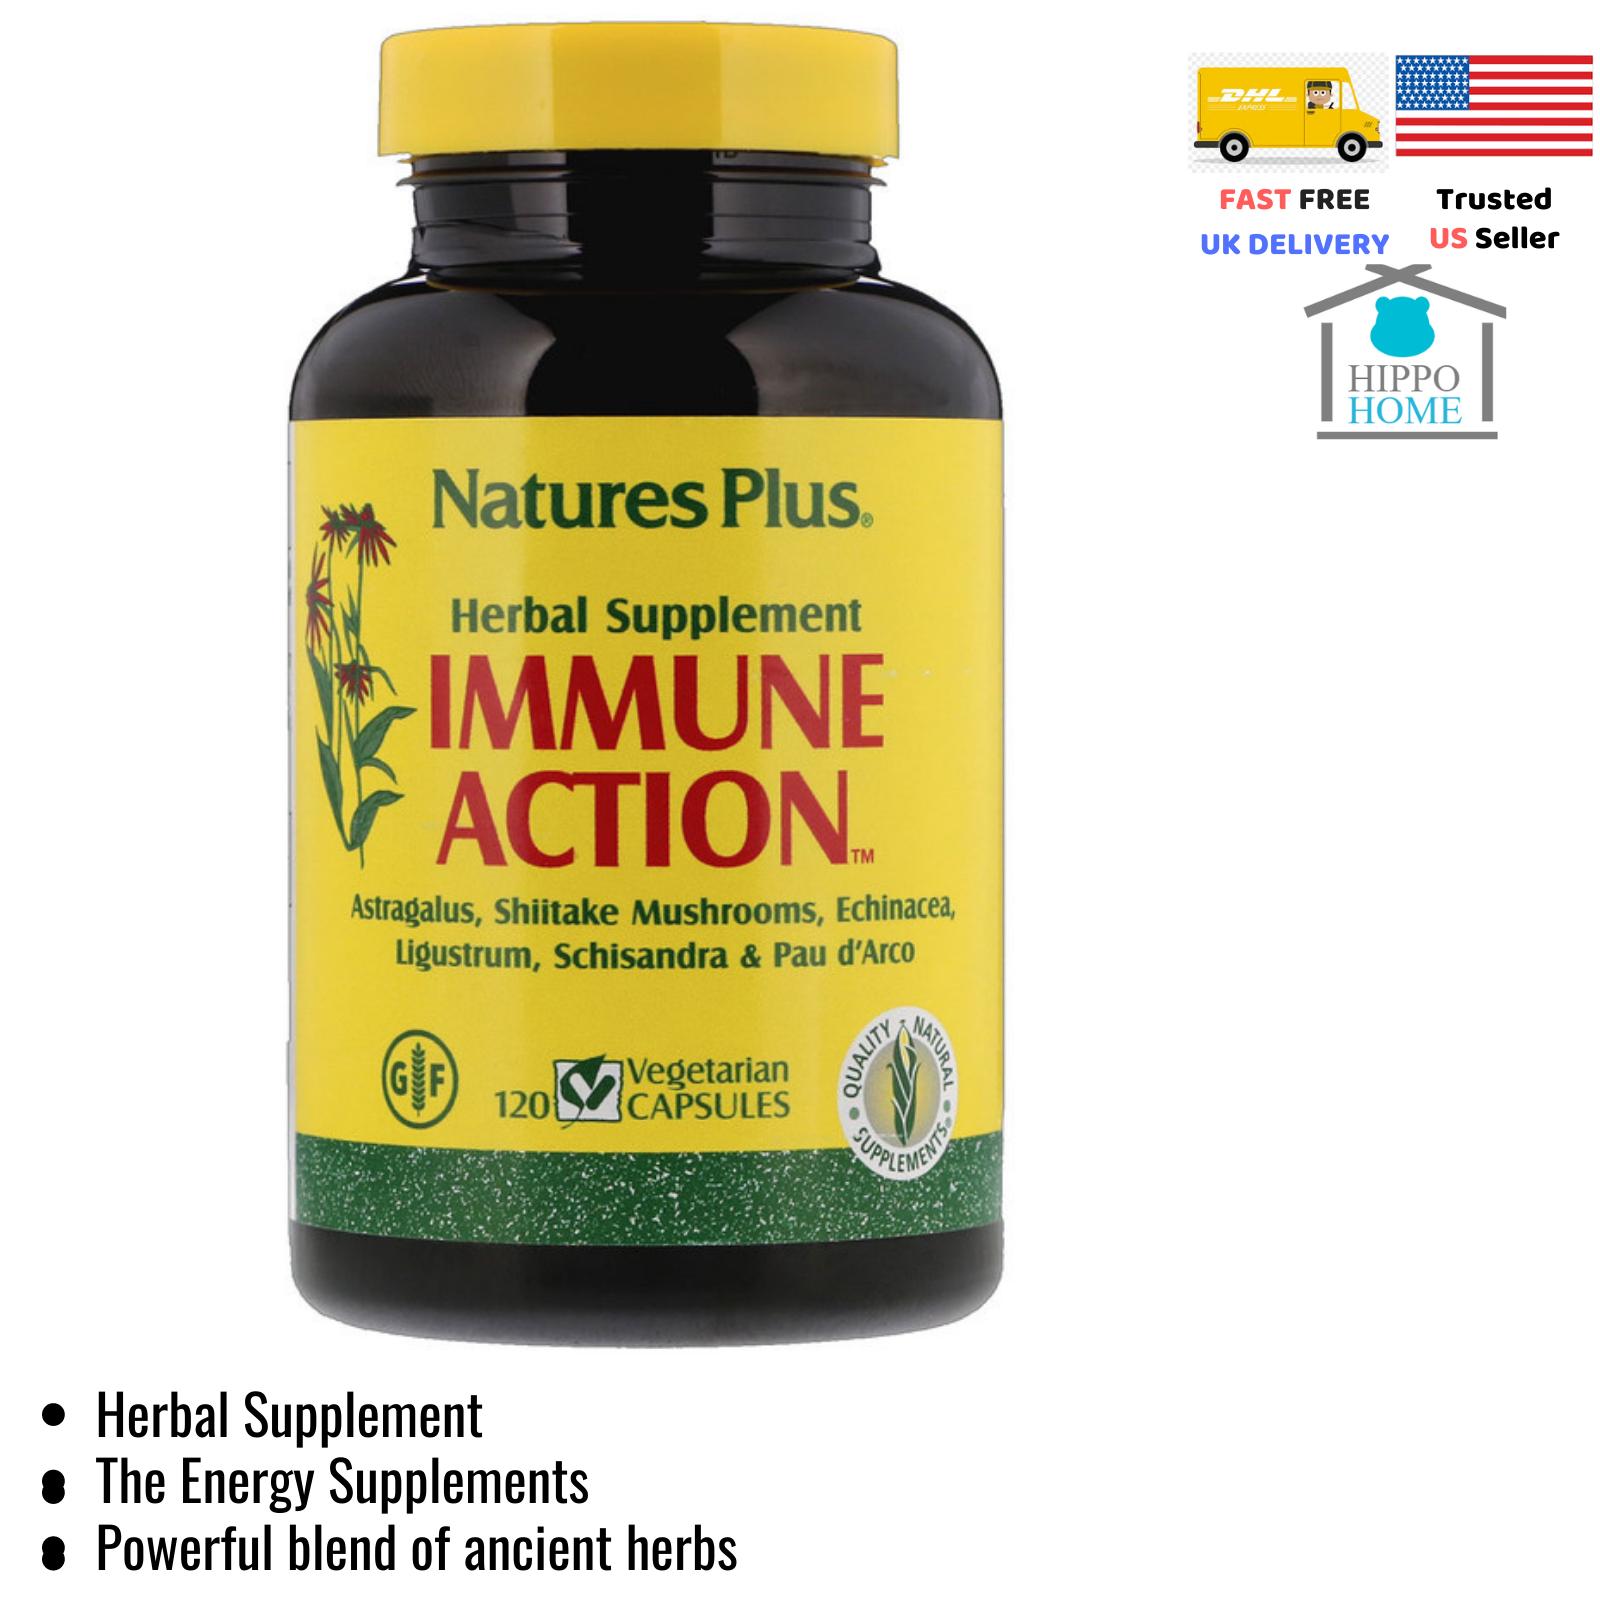 Nature's Plus Immune Action Herbal Supplement120 Vegetarian Capsules